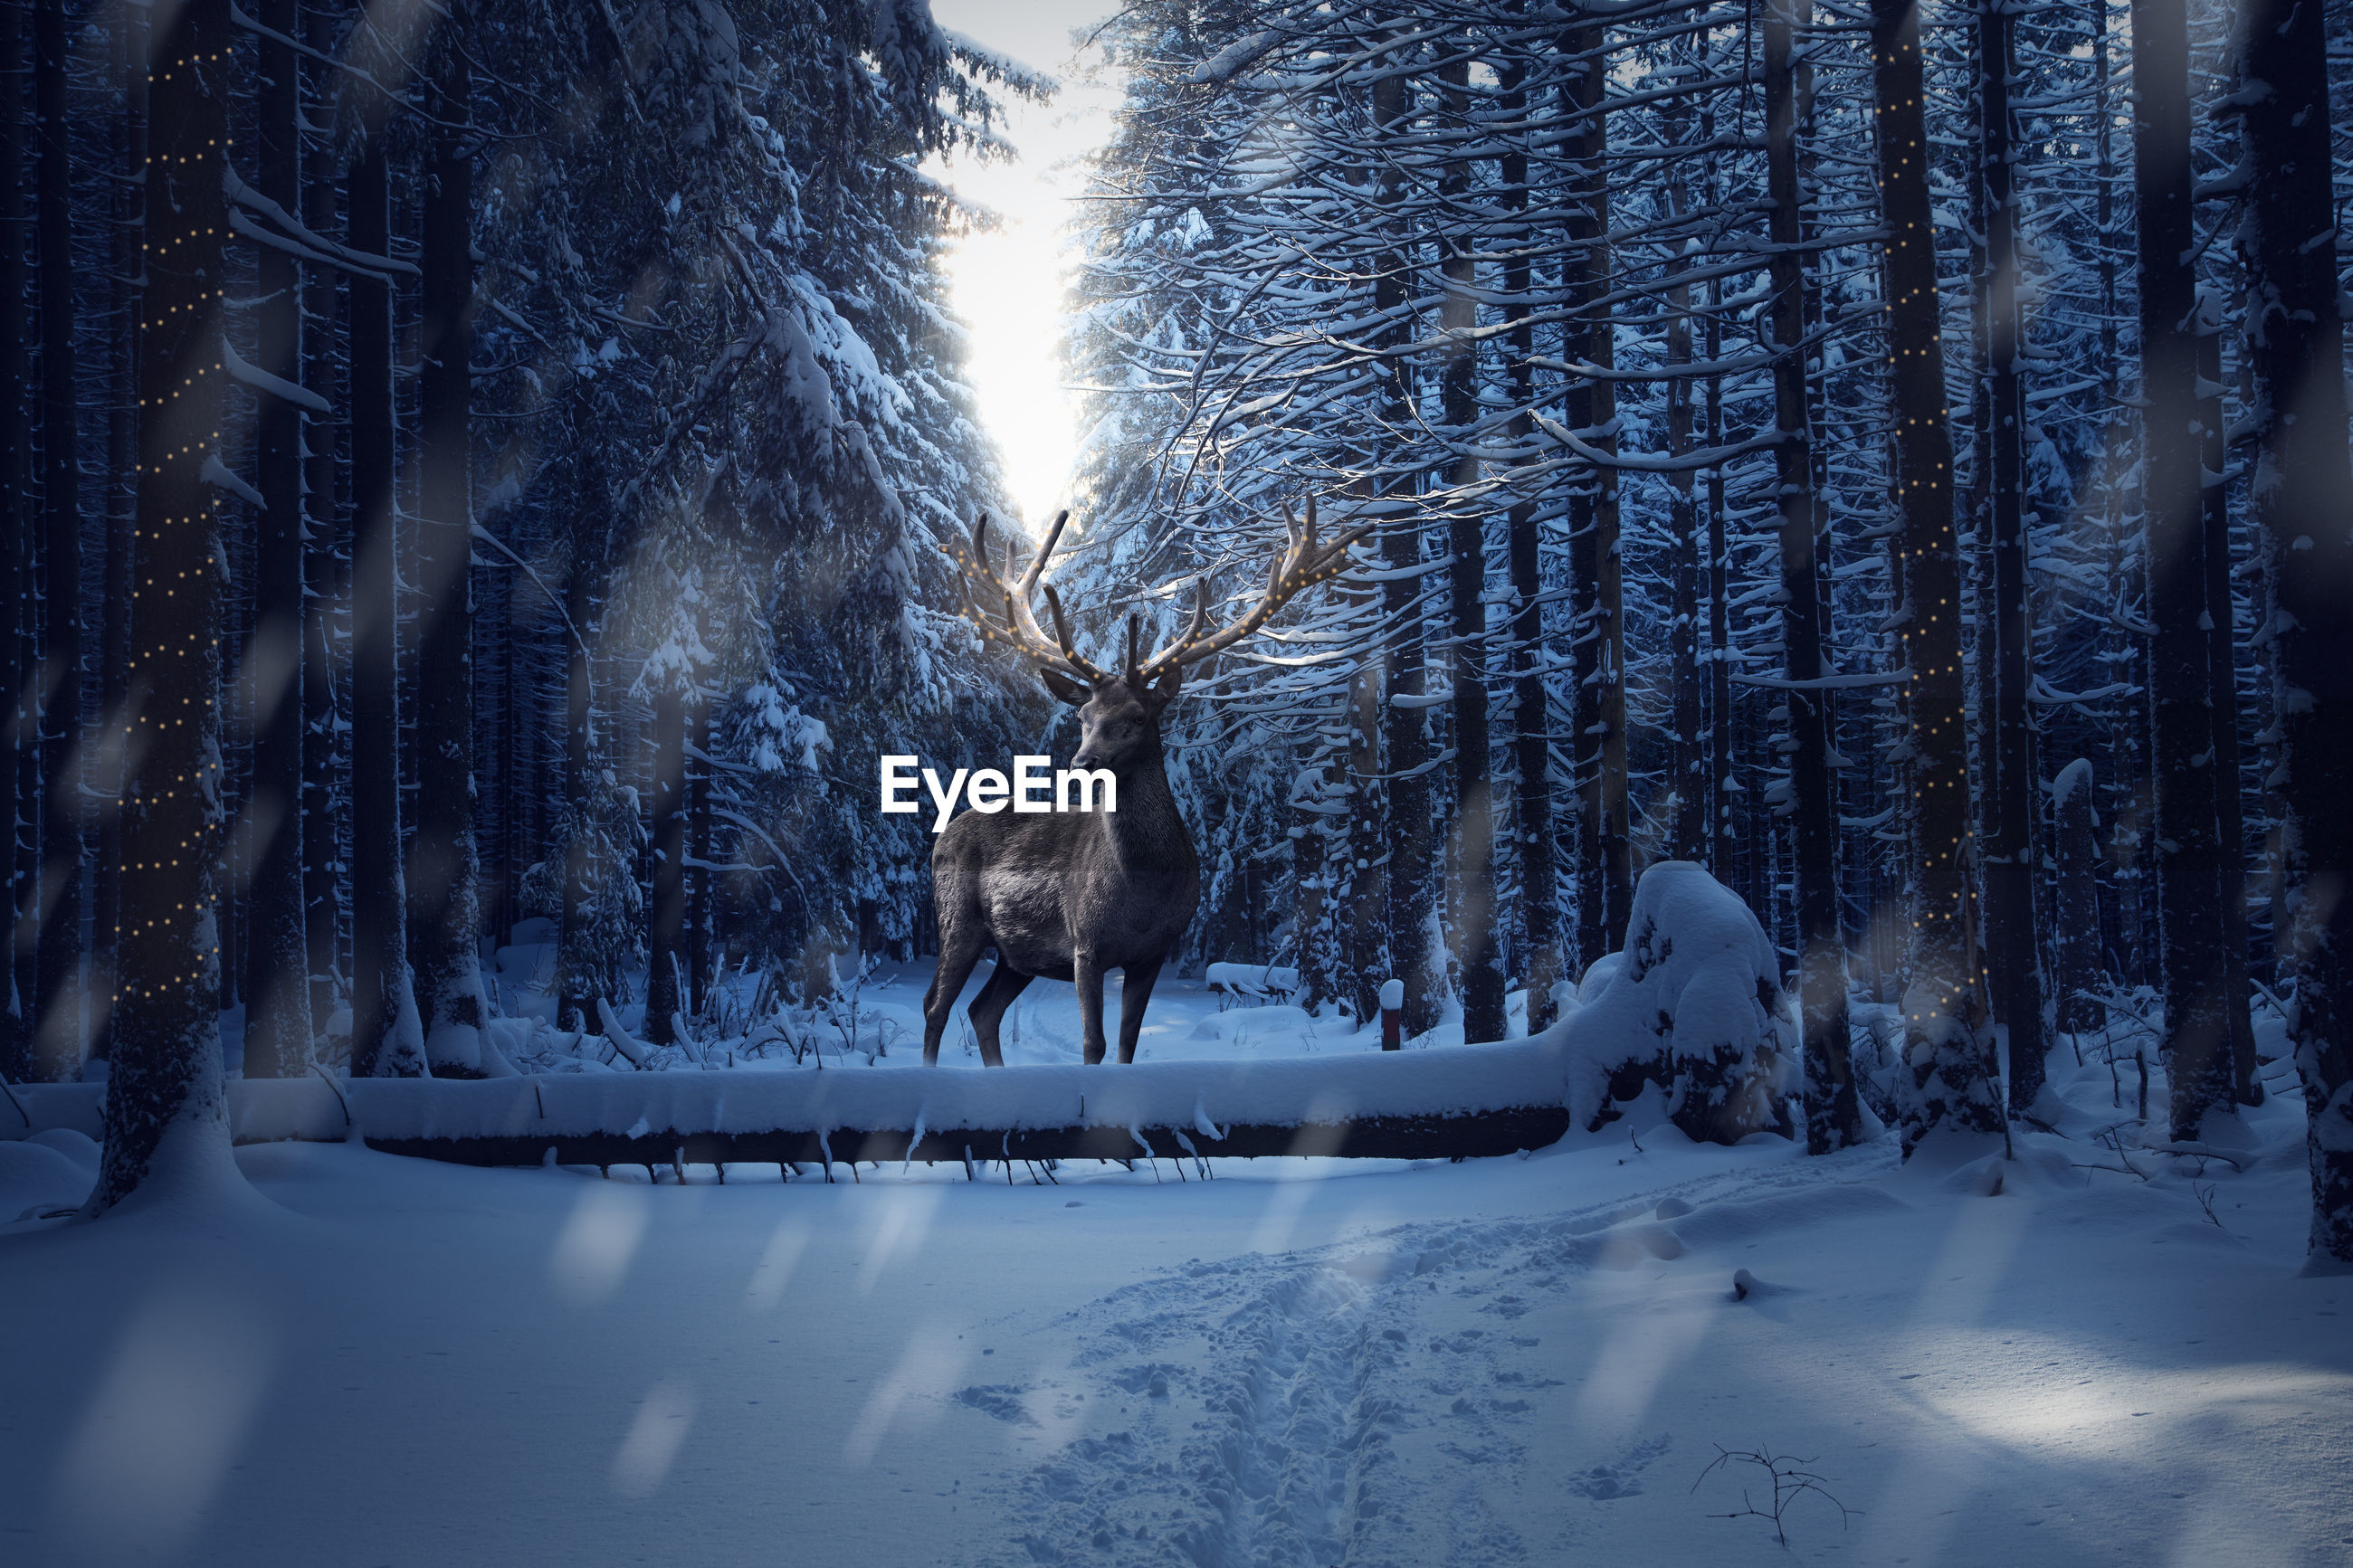 VIEW OF DEER IN SNOW COVERED FIELD